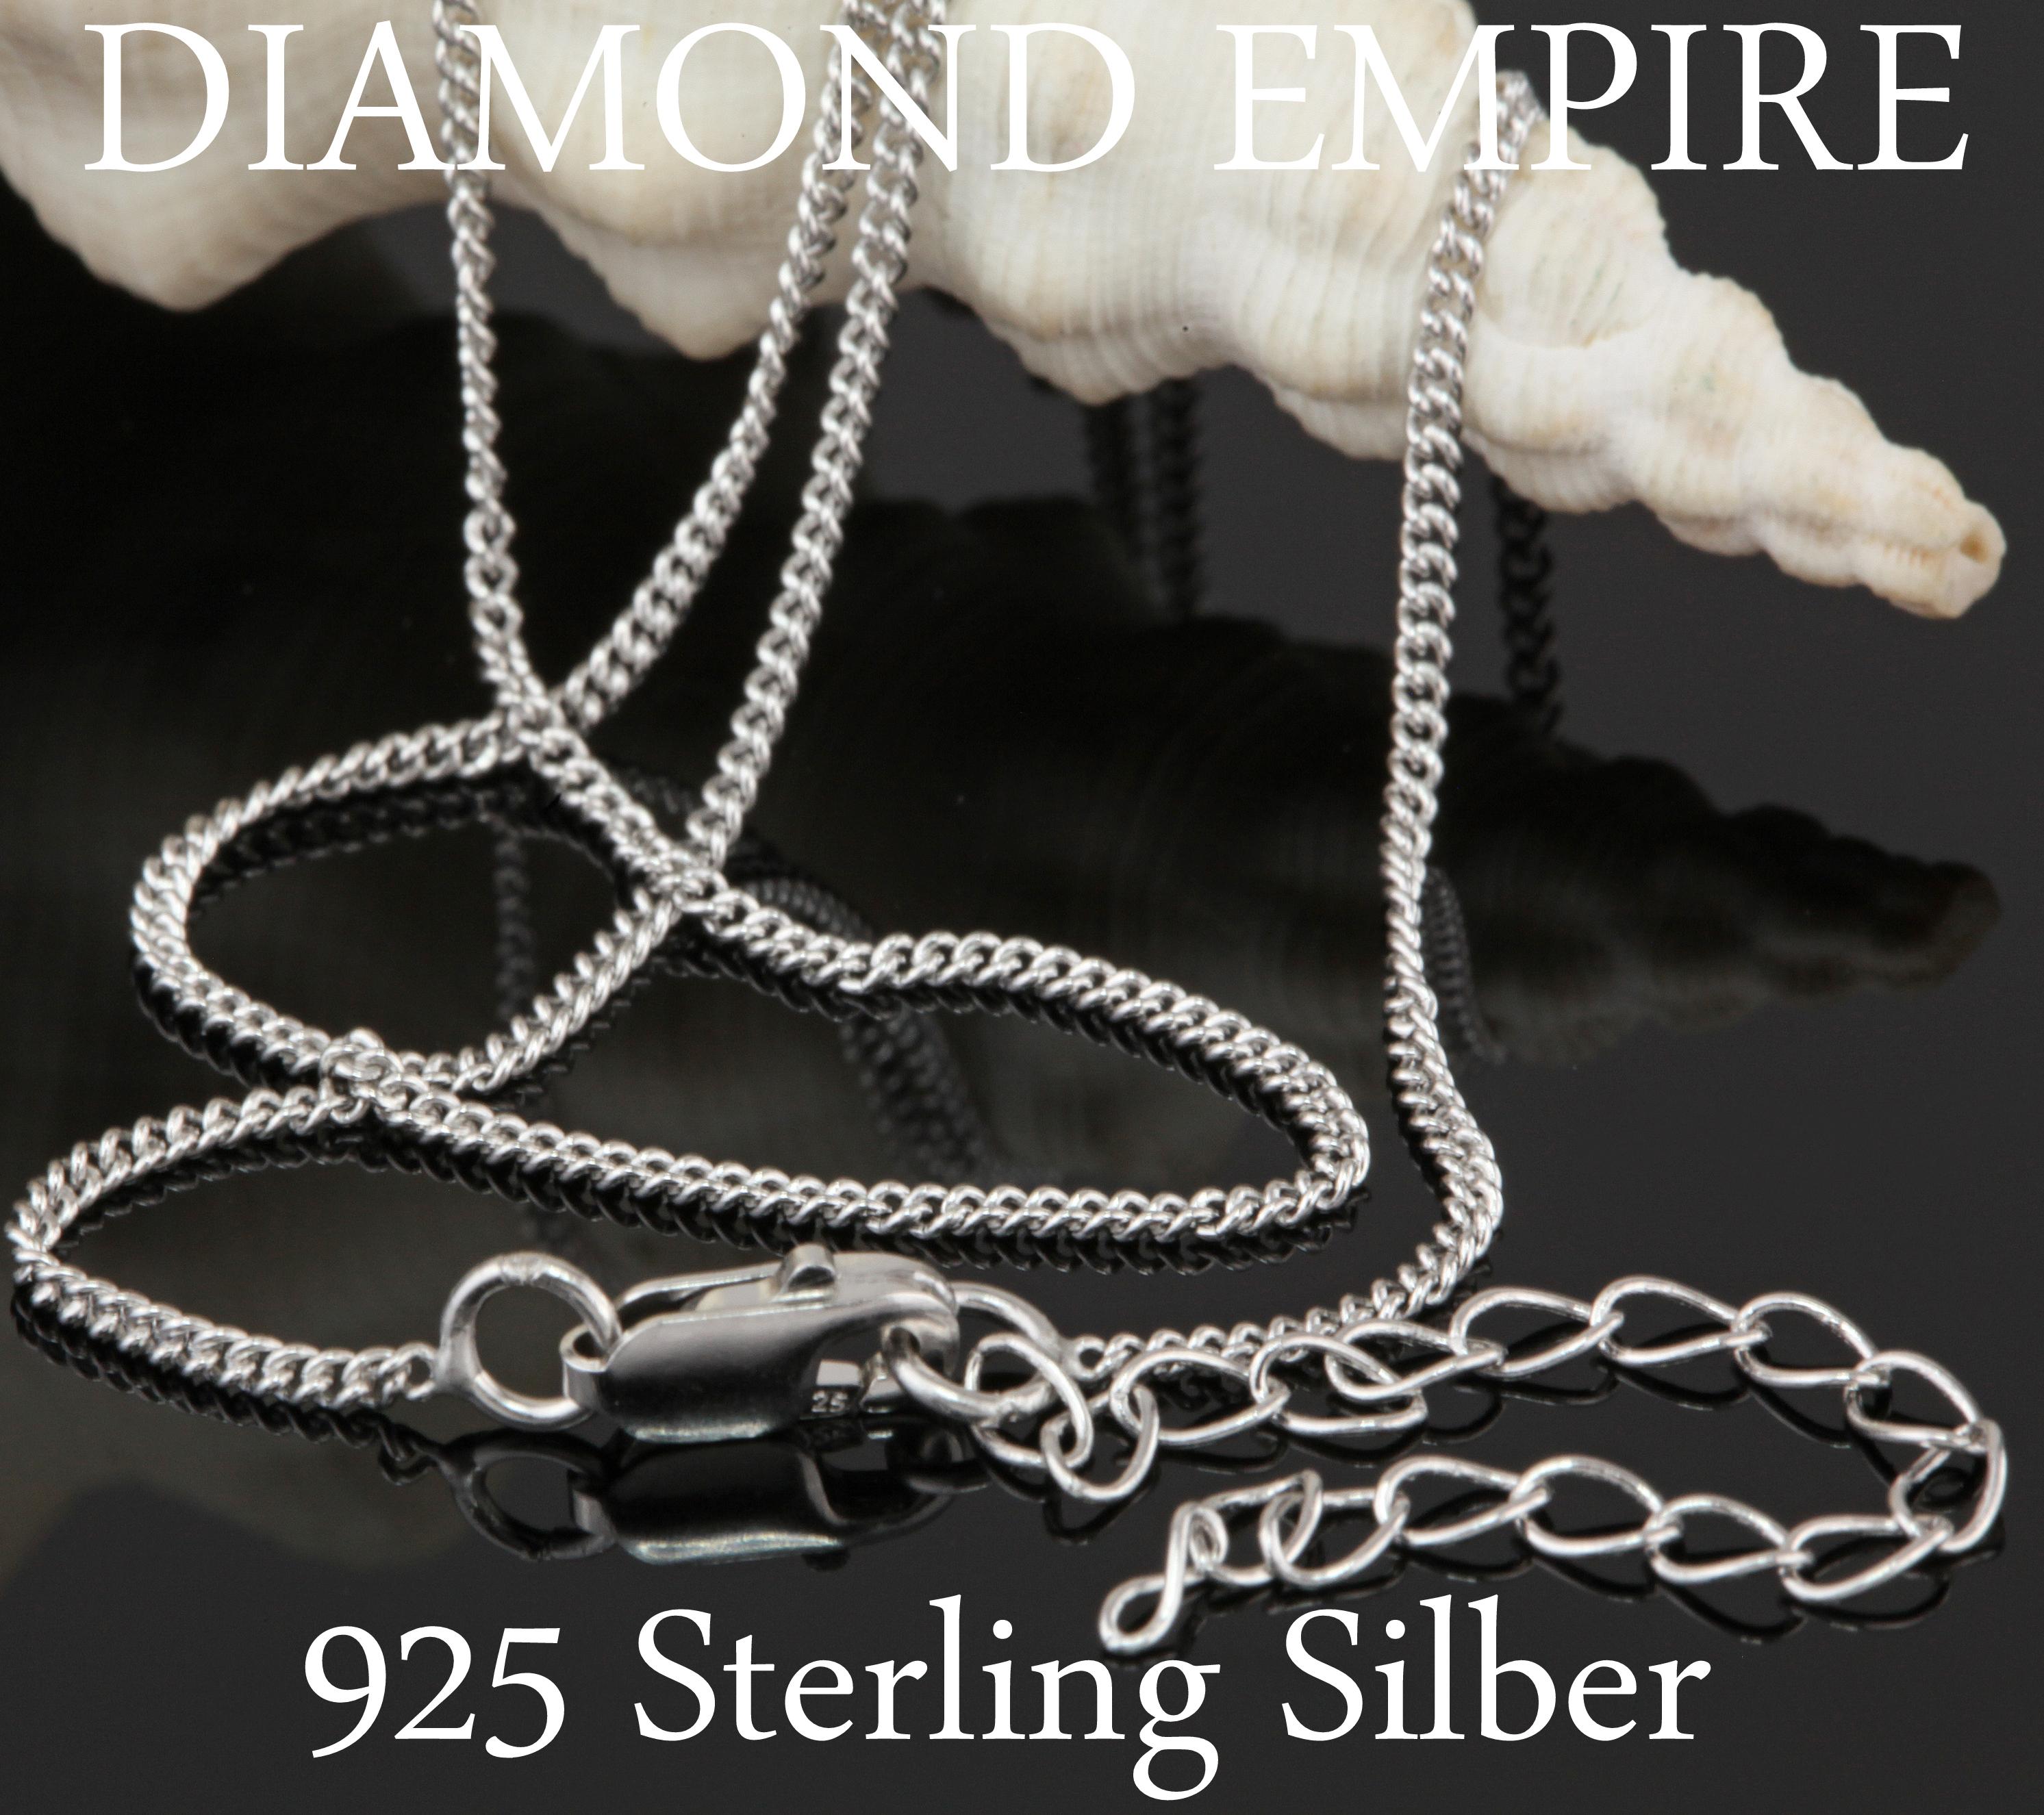 NEU 3 mm Damen Kugelkette 925er echt Silber 45 cm Halskette Kette rhodiniert